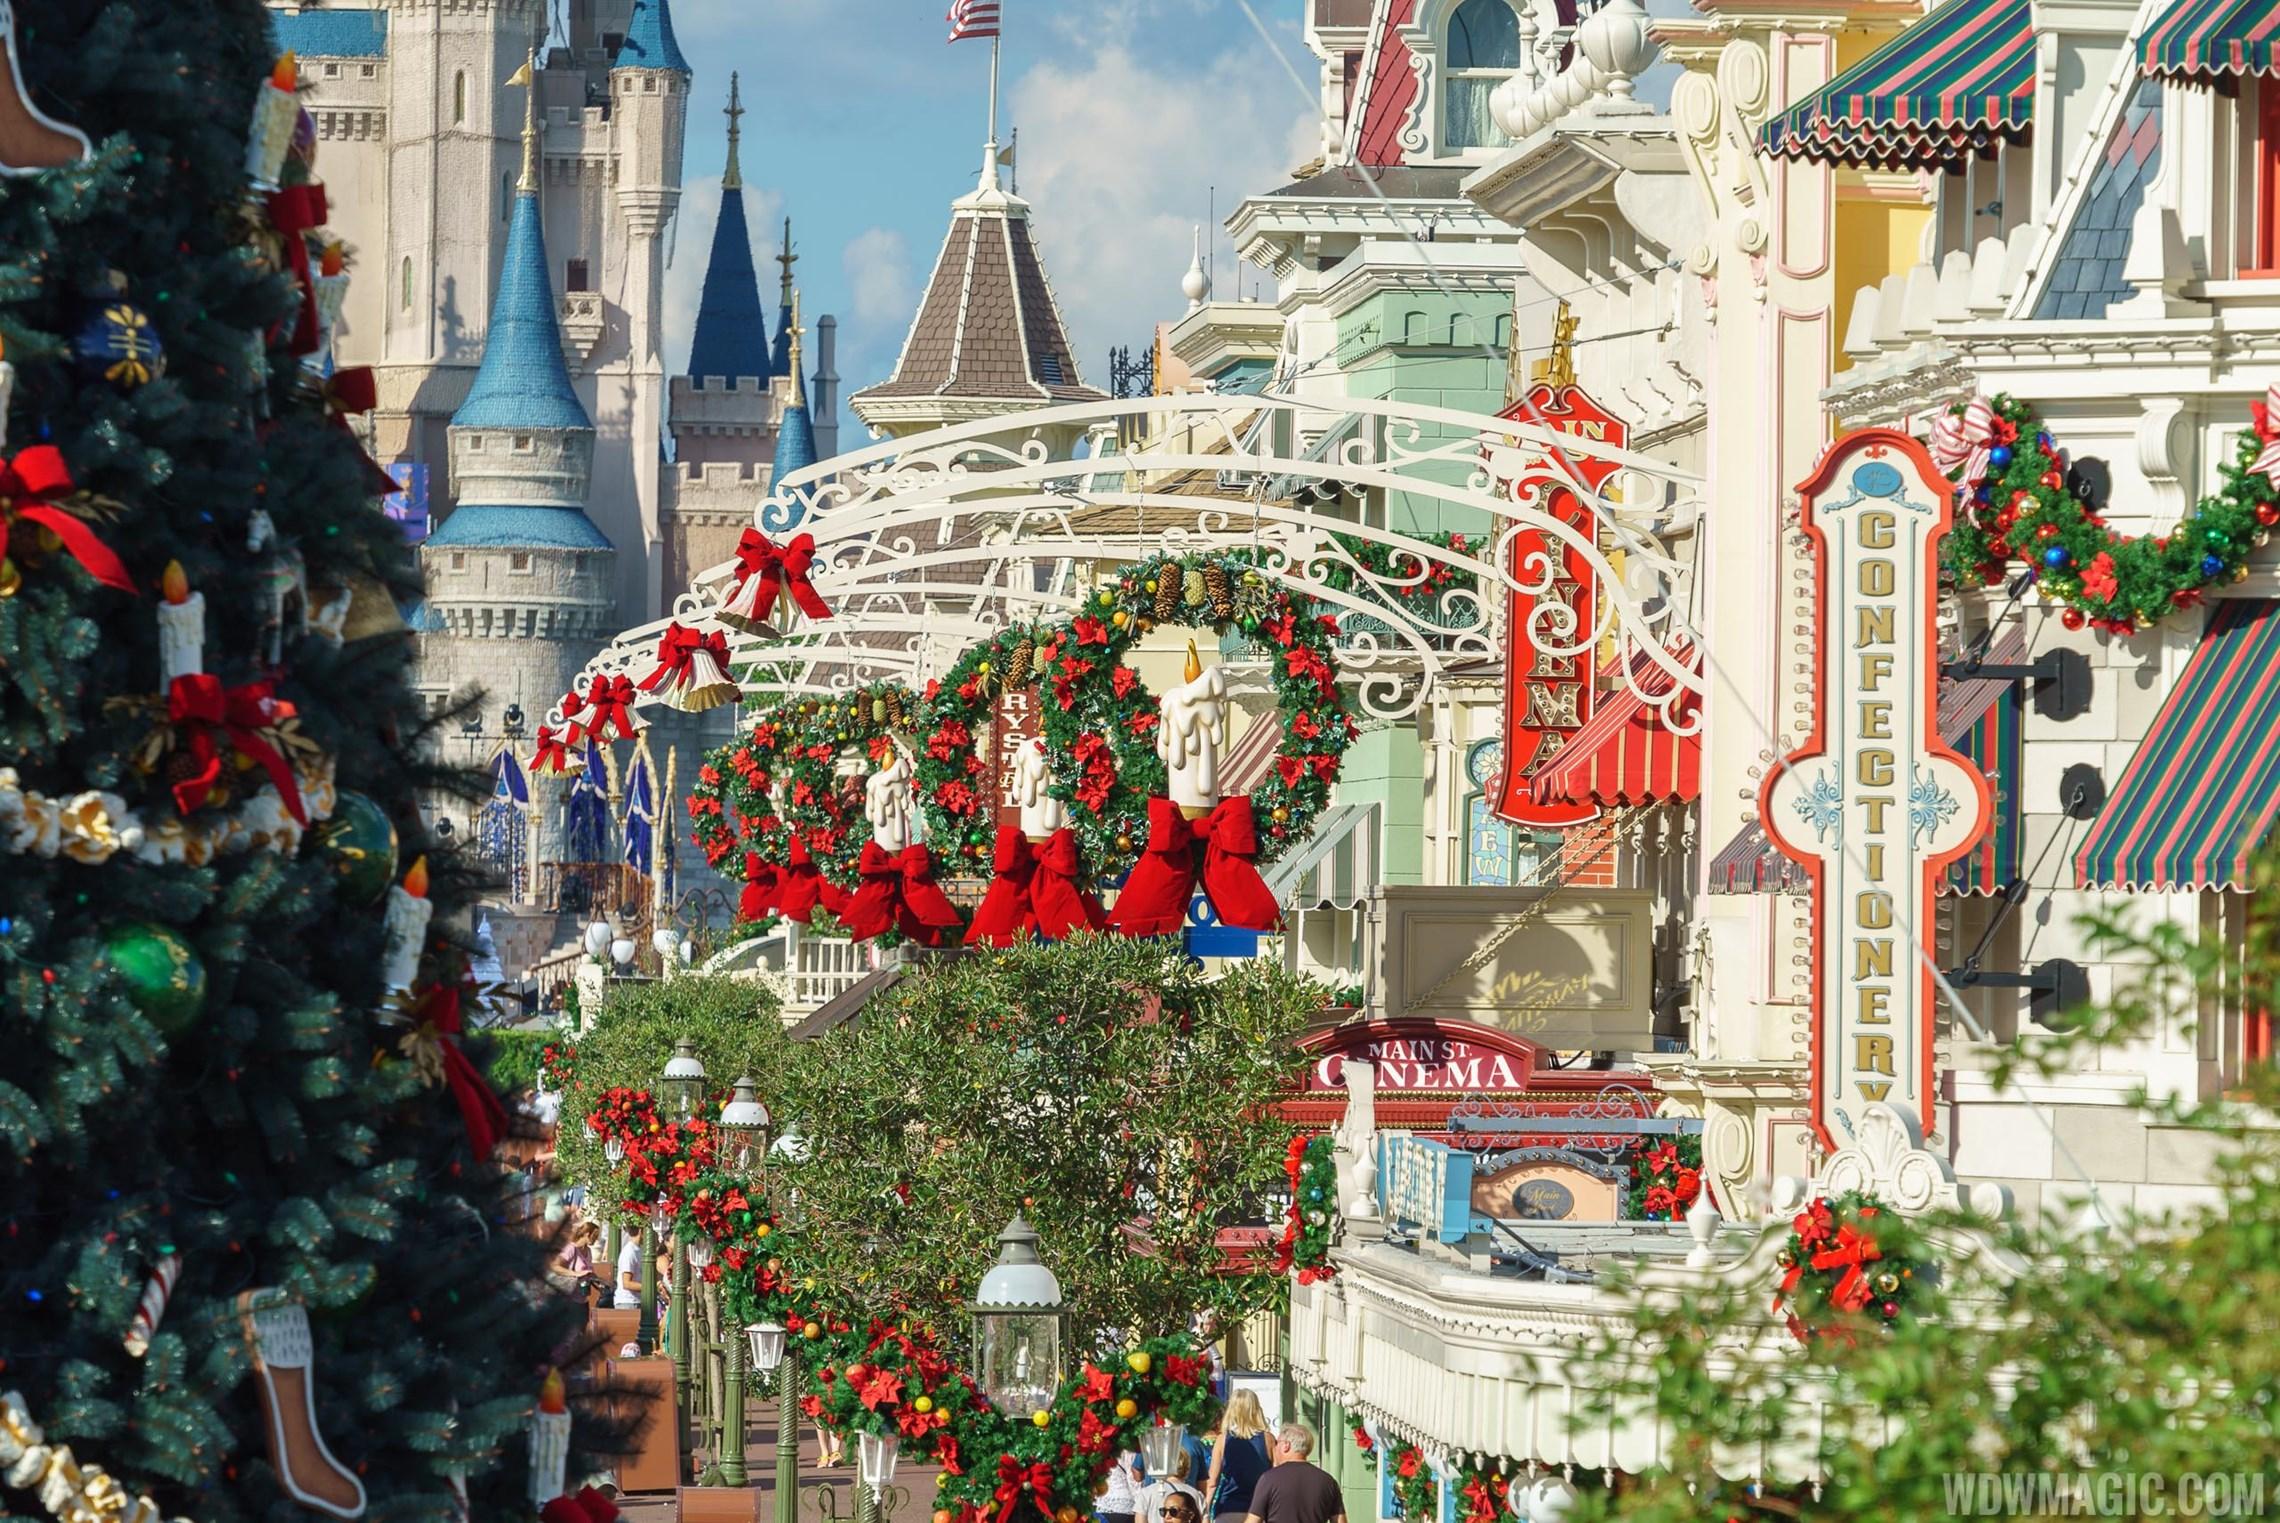 Christmas Holidays decorations at the Magic Kingdom 2017